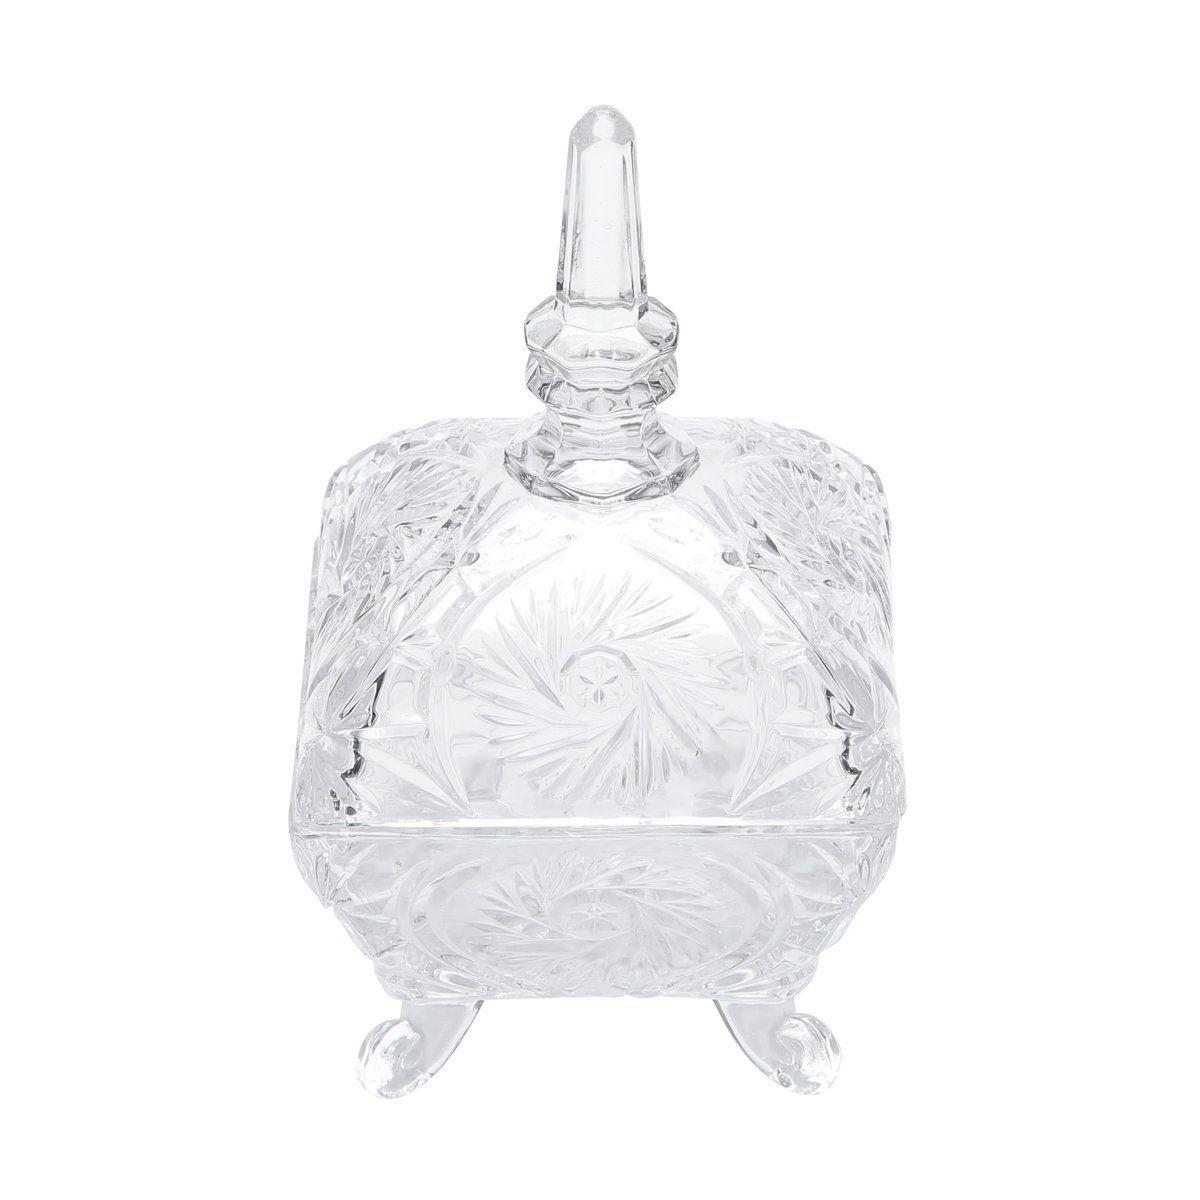 Bomboniere De Cristal Com Tampa Dragon - Lyor